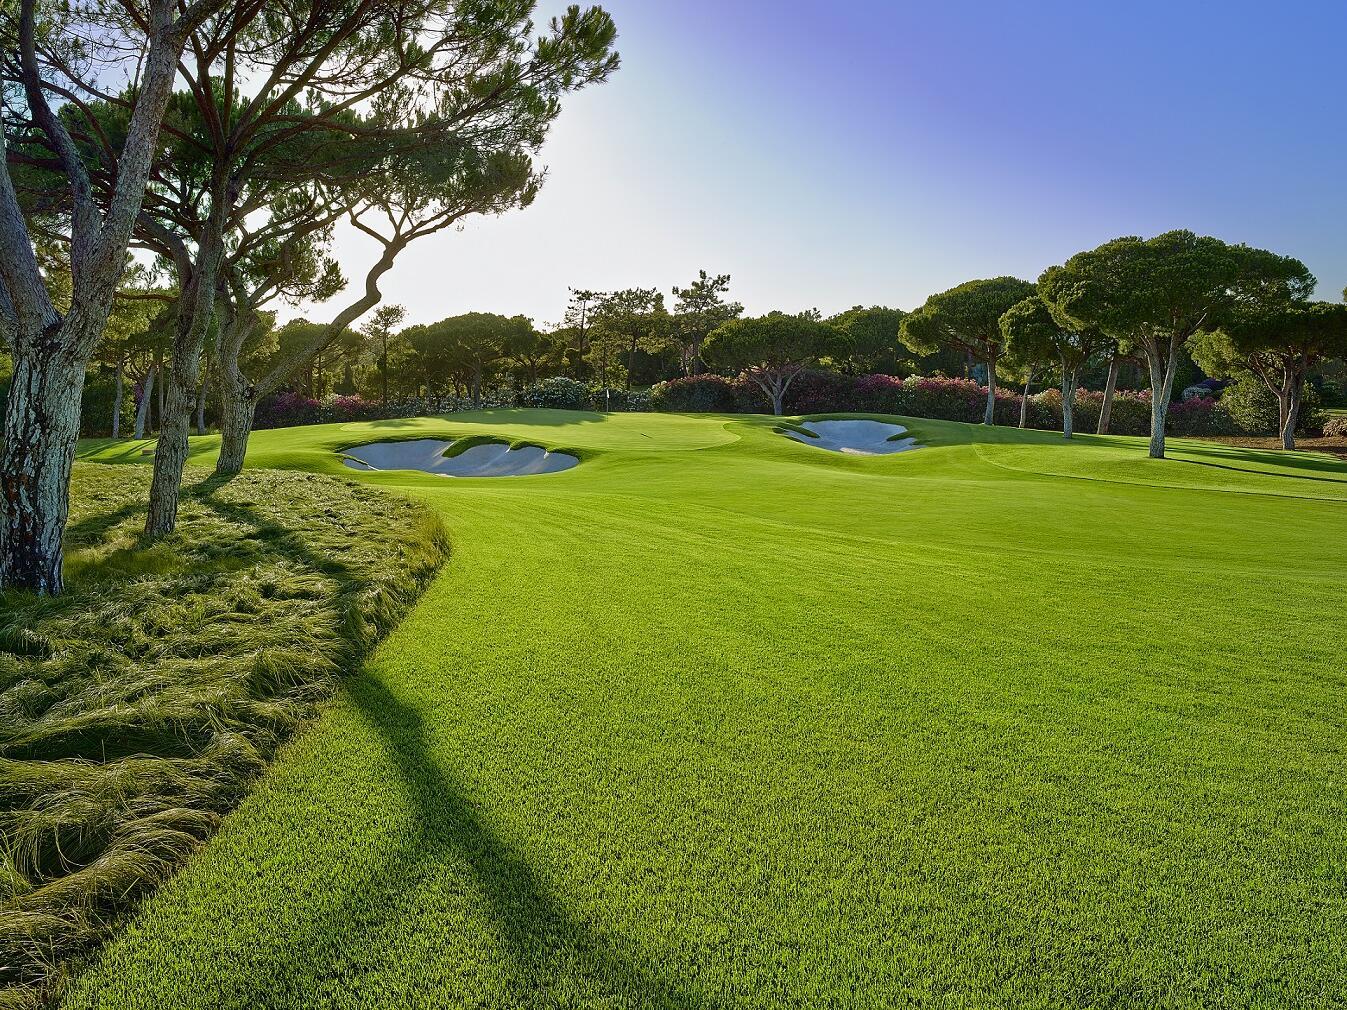 Golf Ground -  The Magnolia Hotel